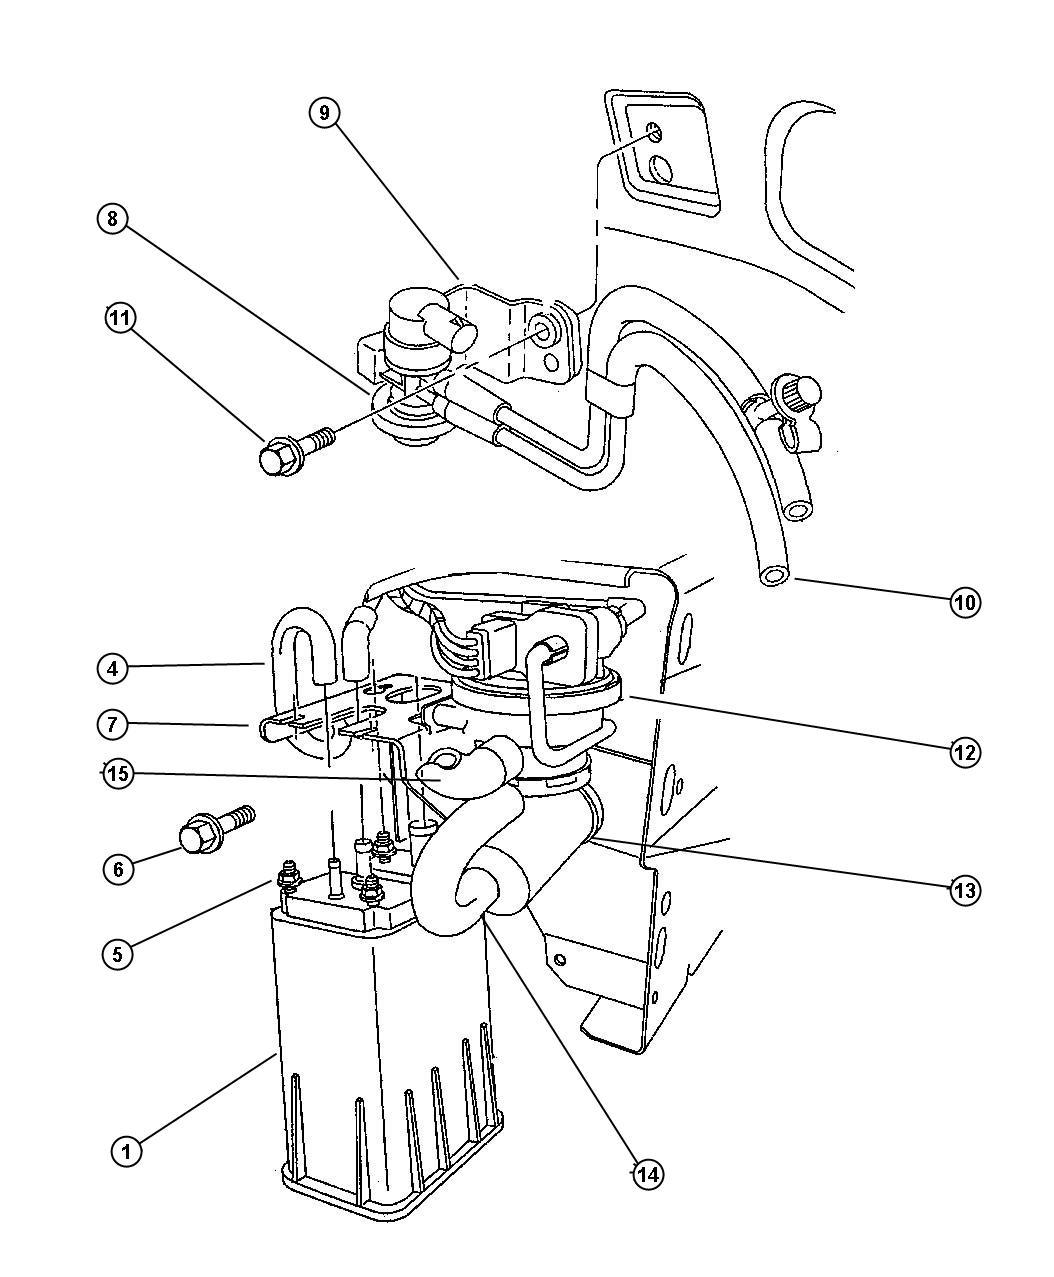 remote starter wiring diagrams images diagram wiring diagrams pictures wiring diagrams